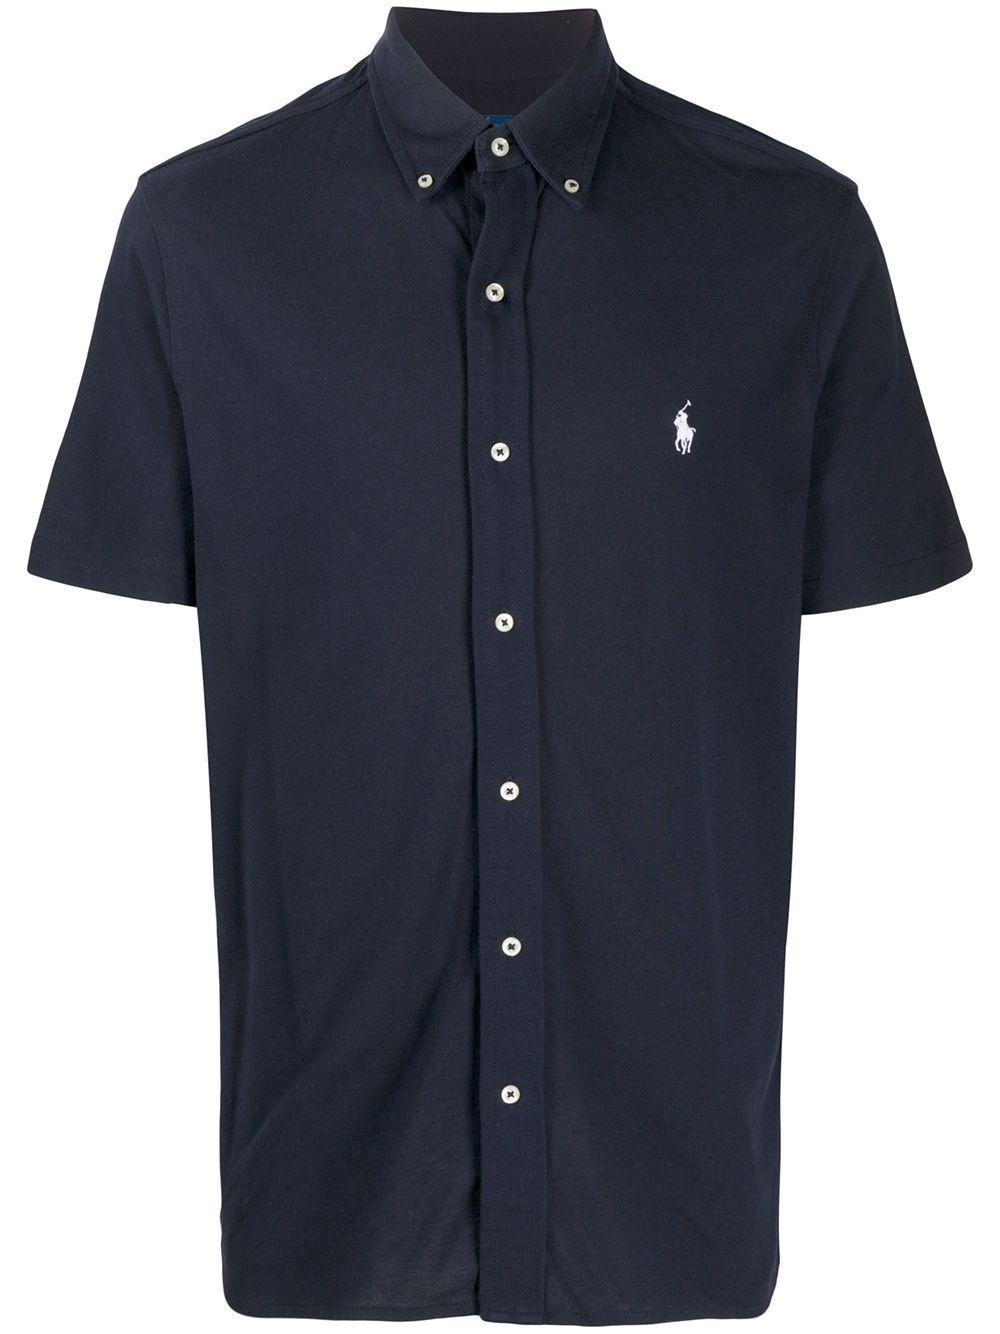 Polo Ralph Lauren Poloshirt mit Knopfleiste - Blau